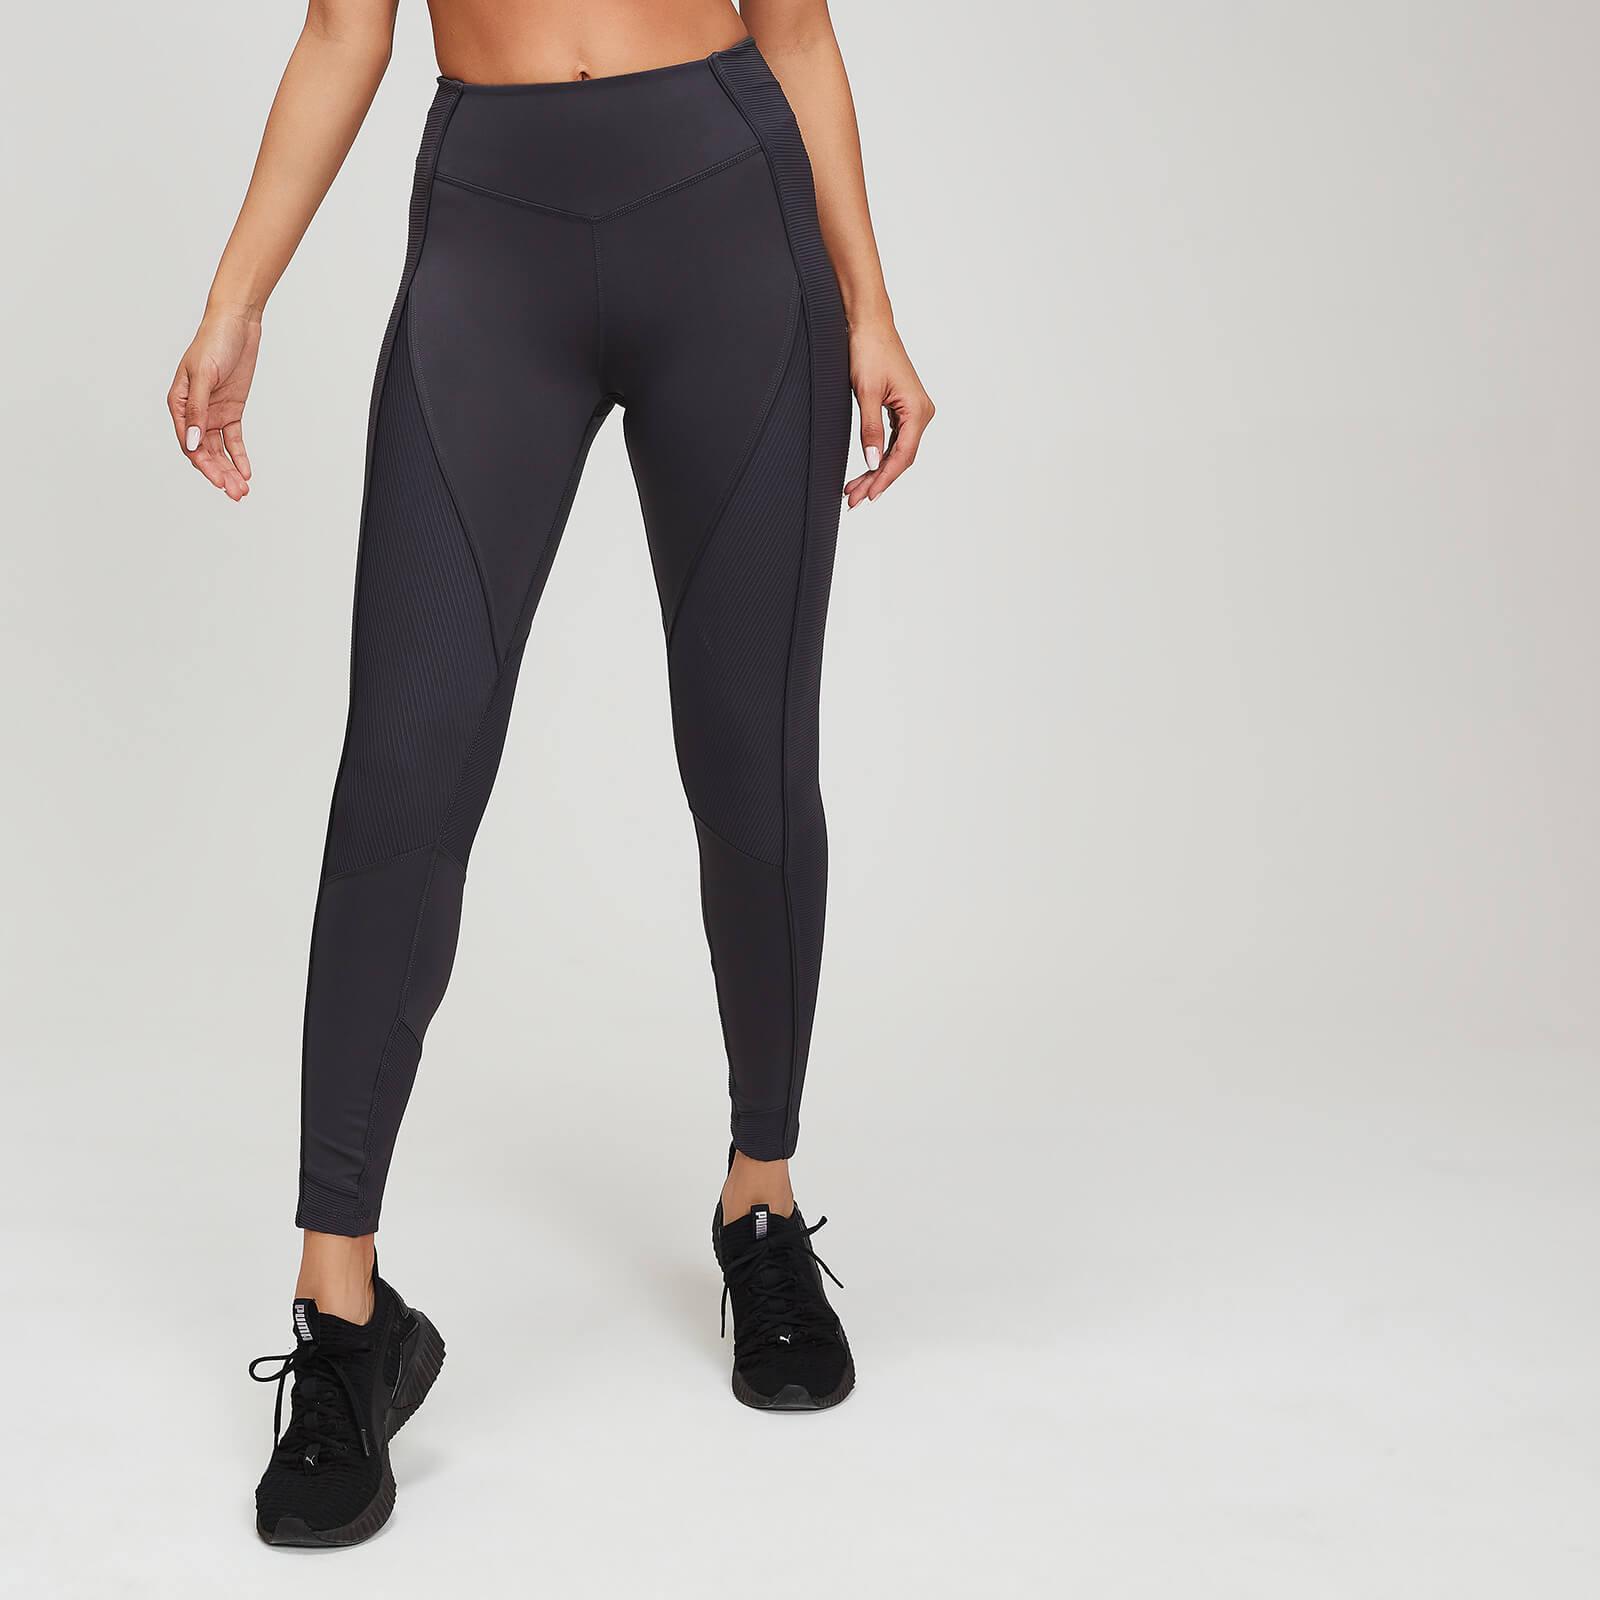 Купить MP Women's Textured Training Leggings - Slate - XS, Myprotein International